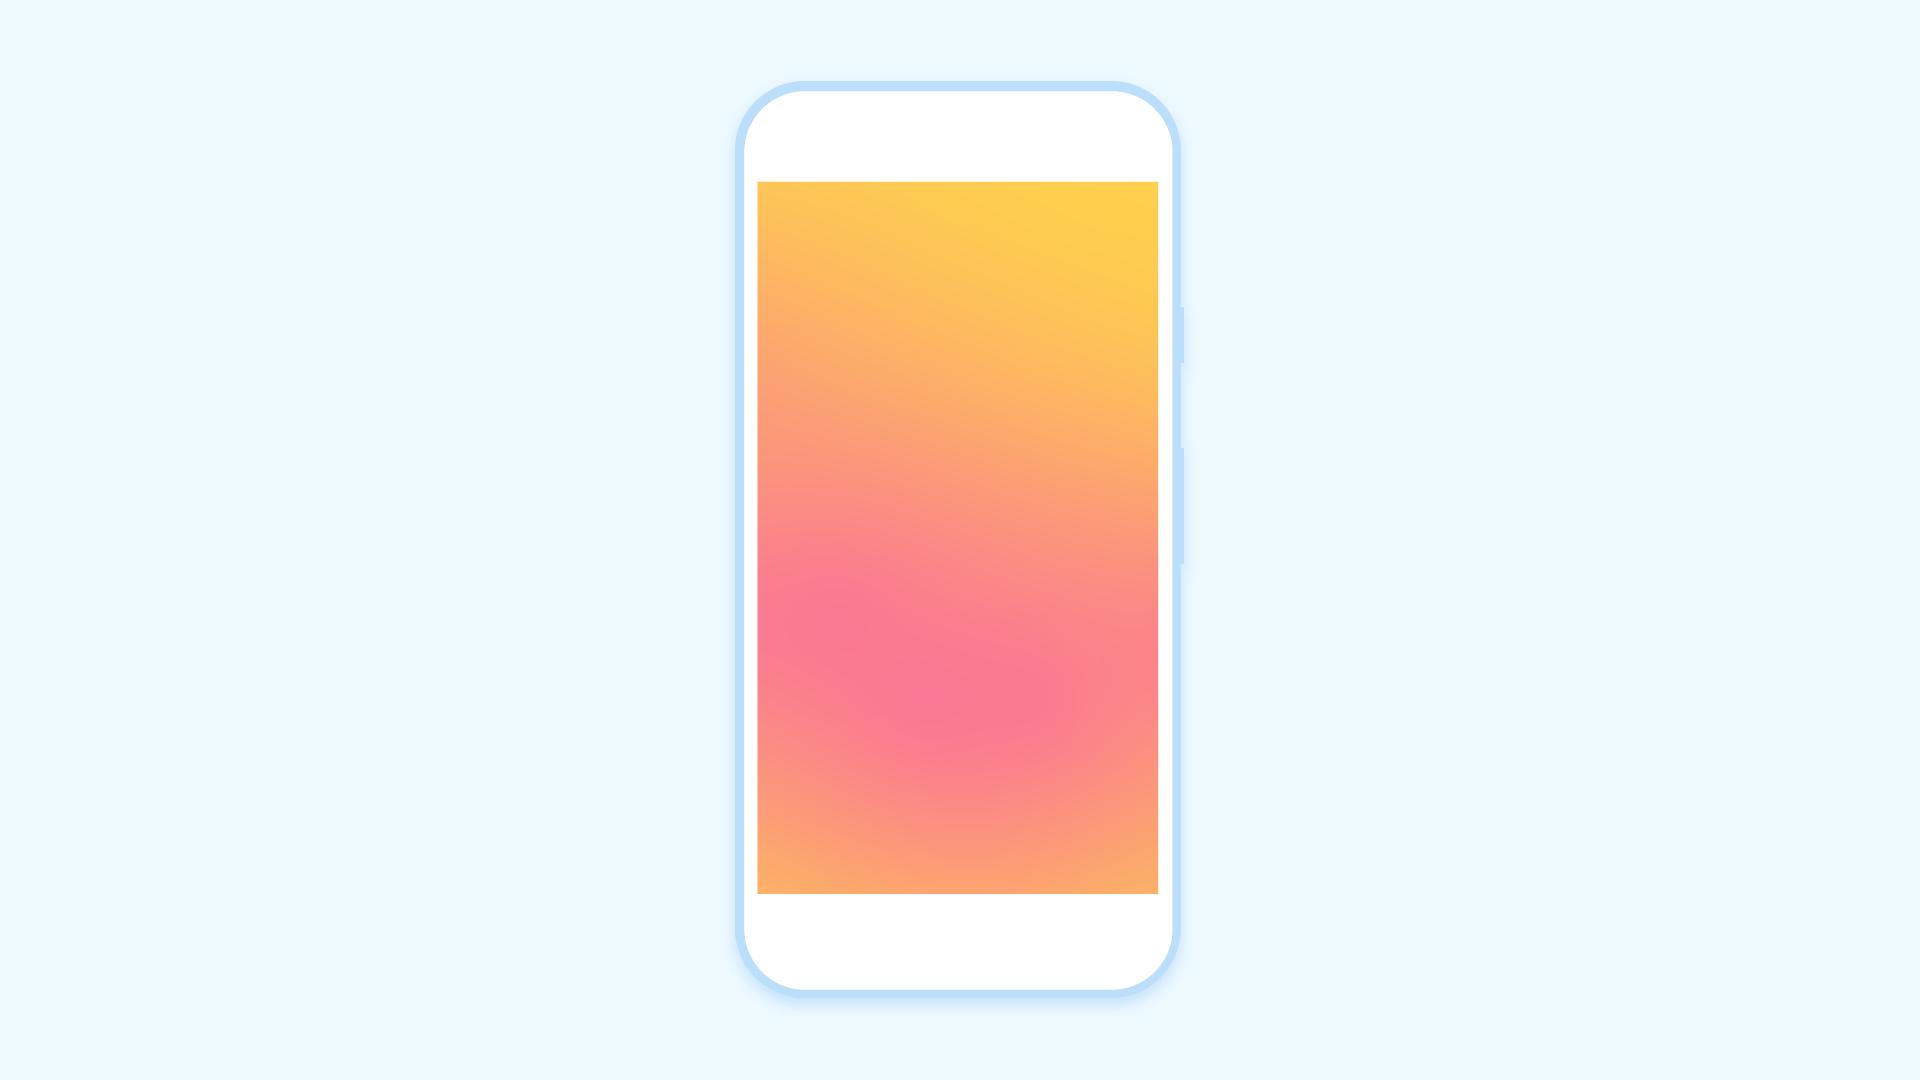 Pixel 3 Recreated - Wallpapers - Zheano Blog